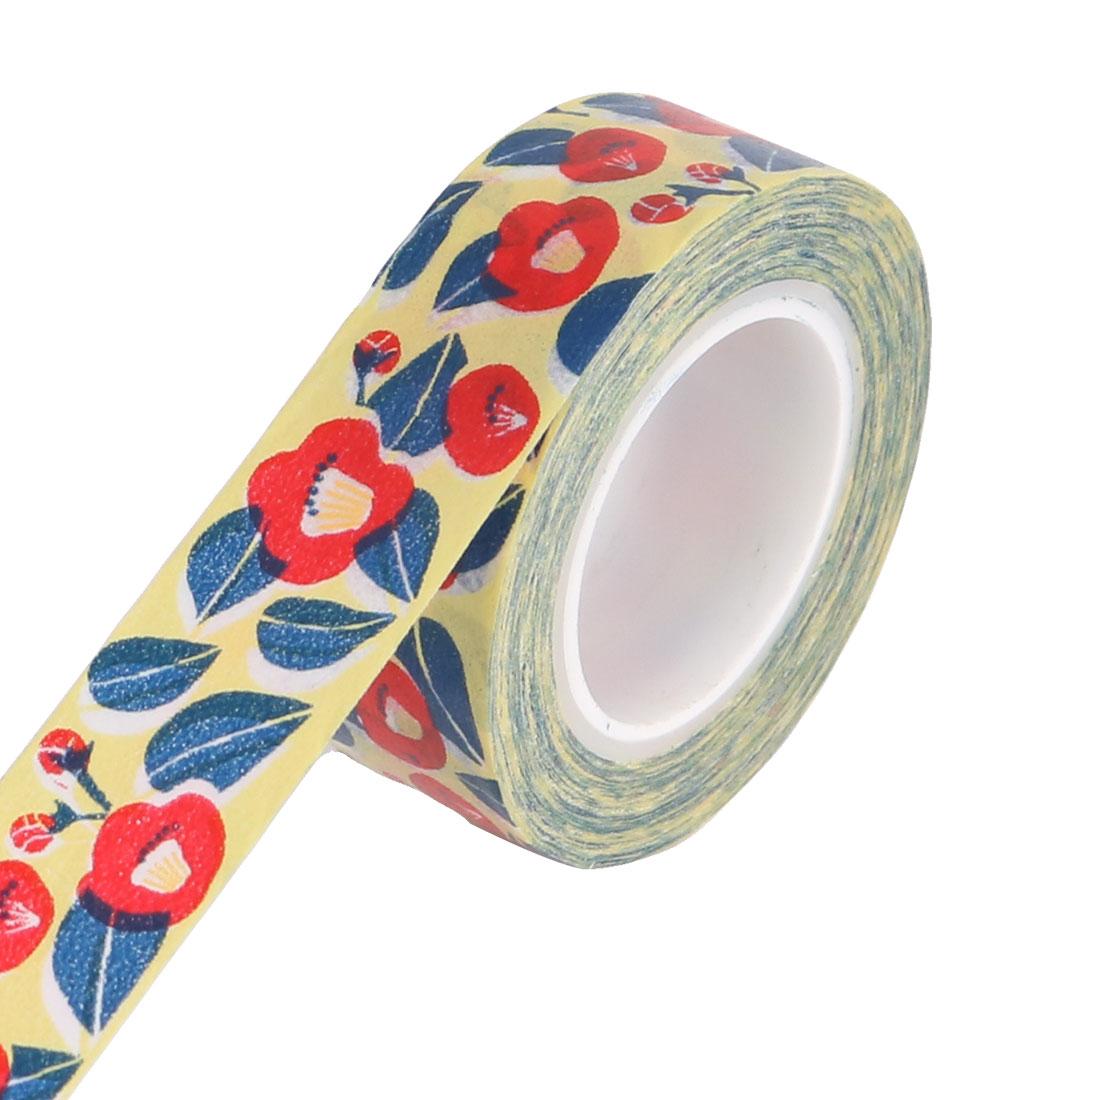 Flower Pattern DIY Craft Scrapbooking Decorative Washi Masking Tape Sticker Roll